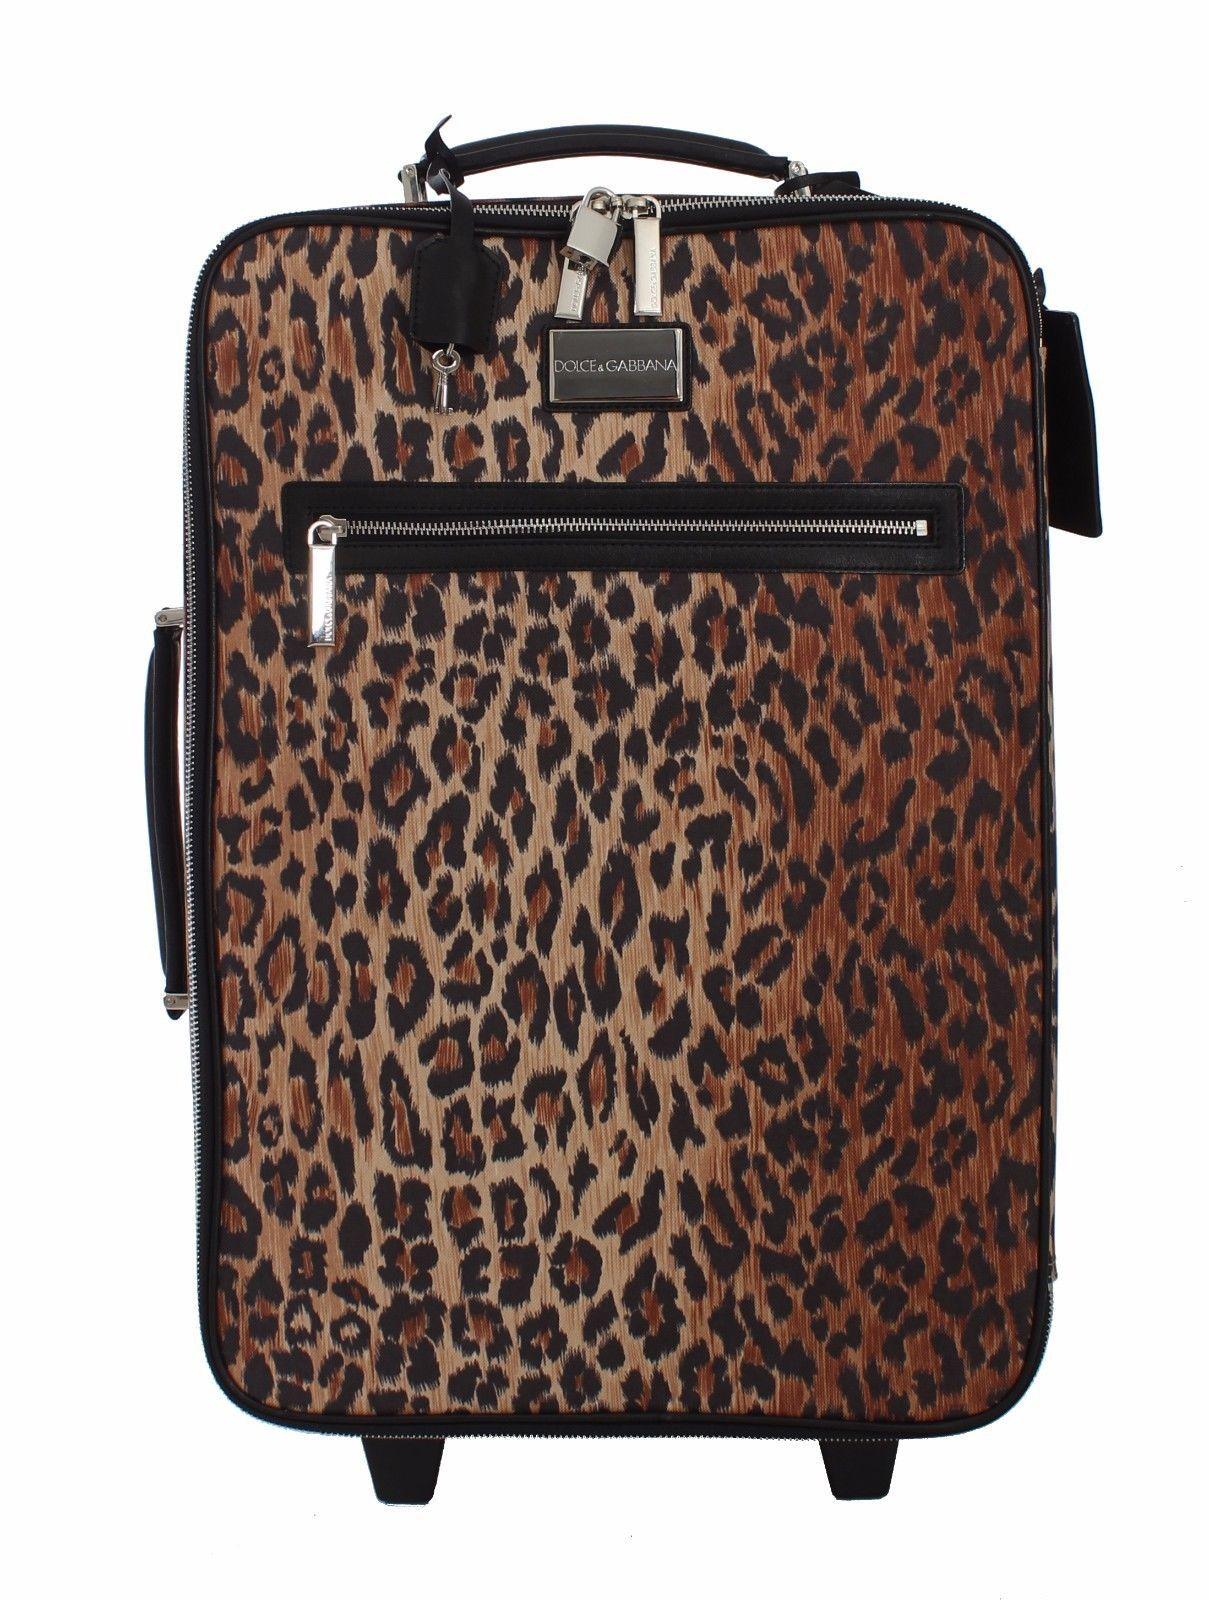 Dolce   Gabbana Luggage Bag Leopard Travel Cabin Suitcase Trolley ... 6e2072cfef230